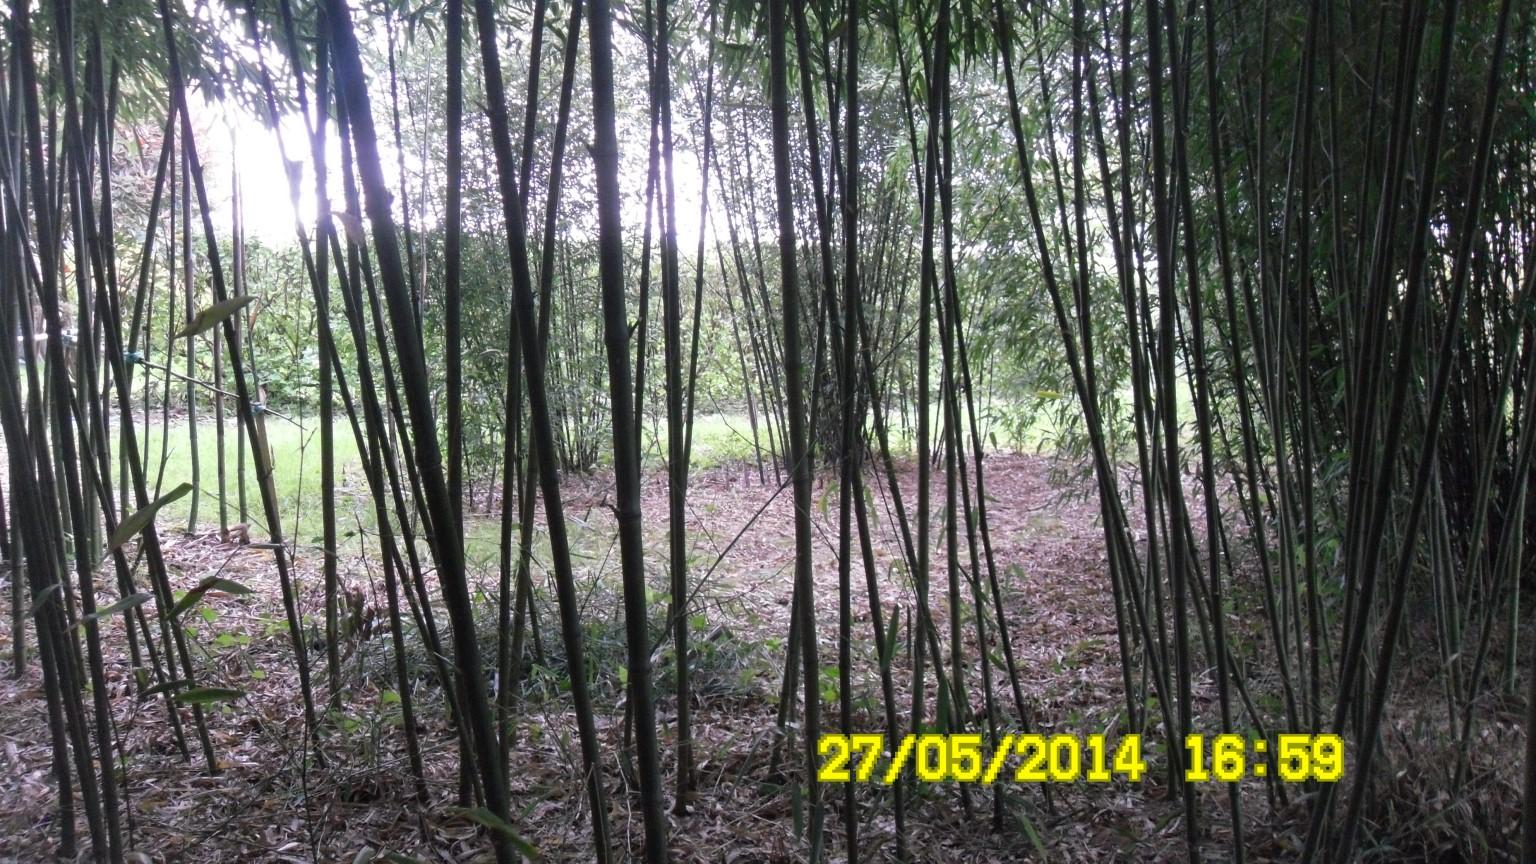 jardin de bambous NET fait le 27 MAI% % JPG